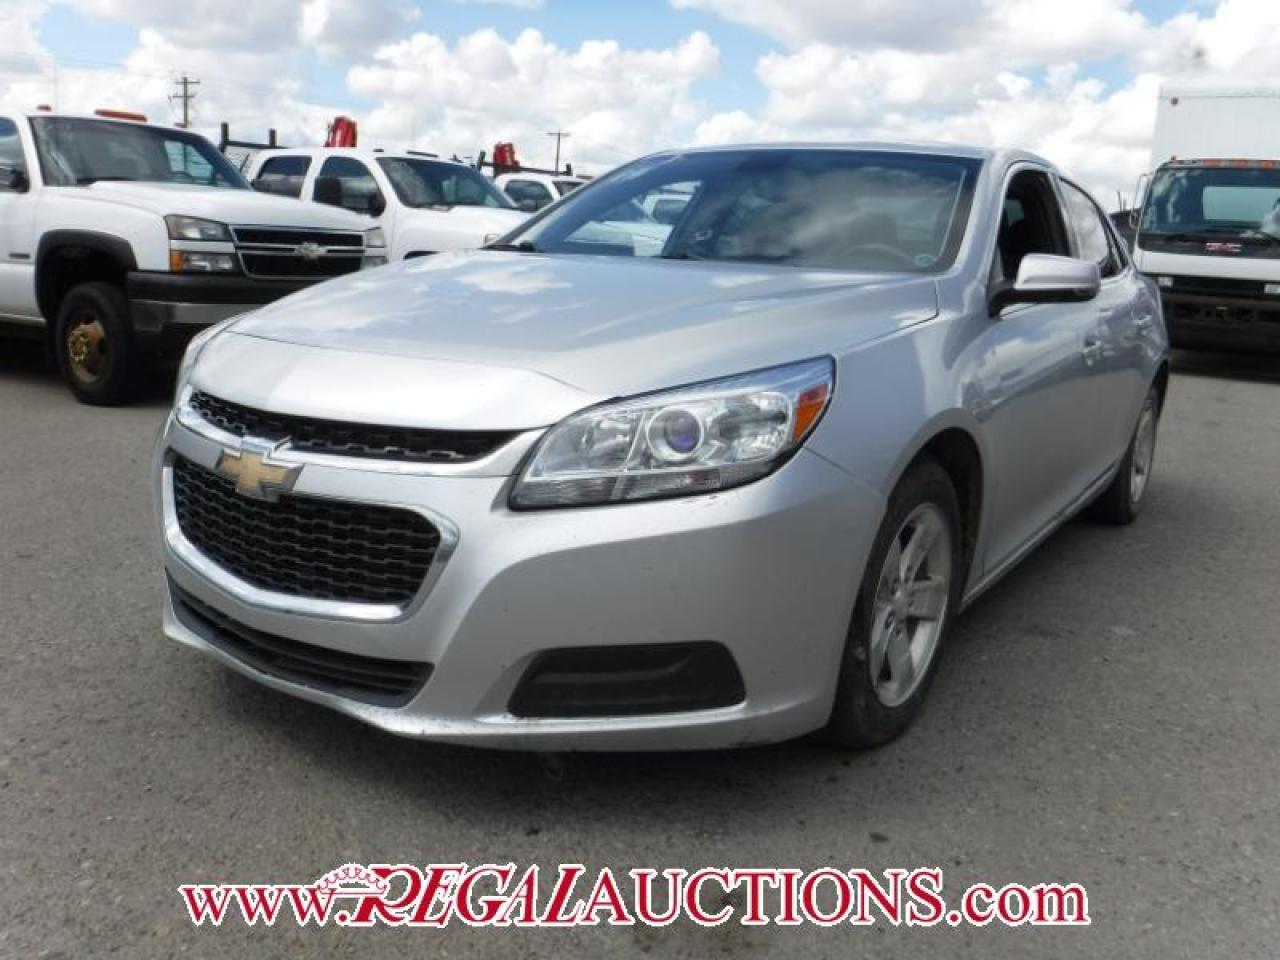 Photo of Silver 2014 Chevrolet MALIBU 1LT 4D SEDAN 2.5L